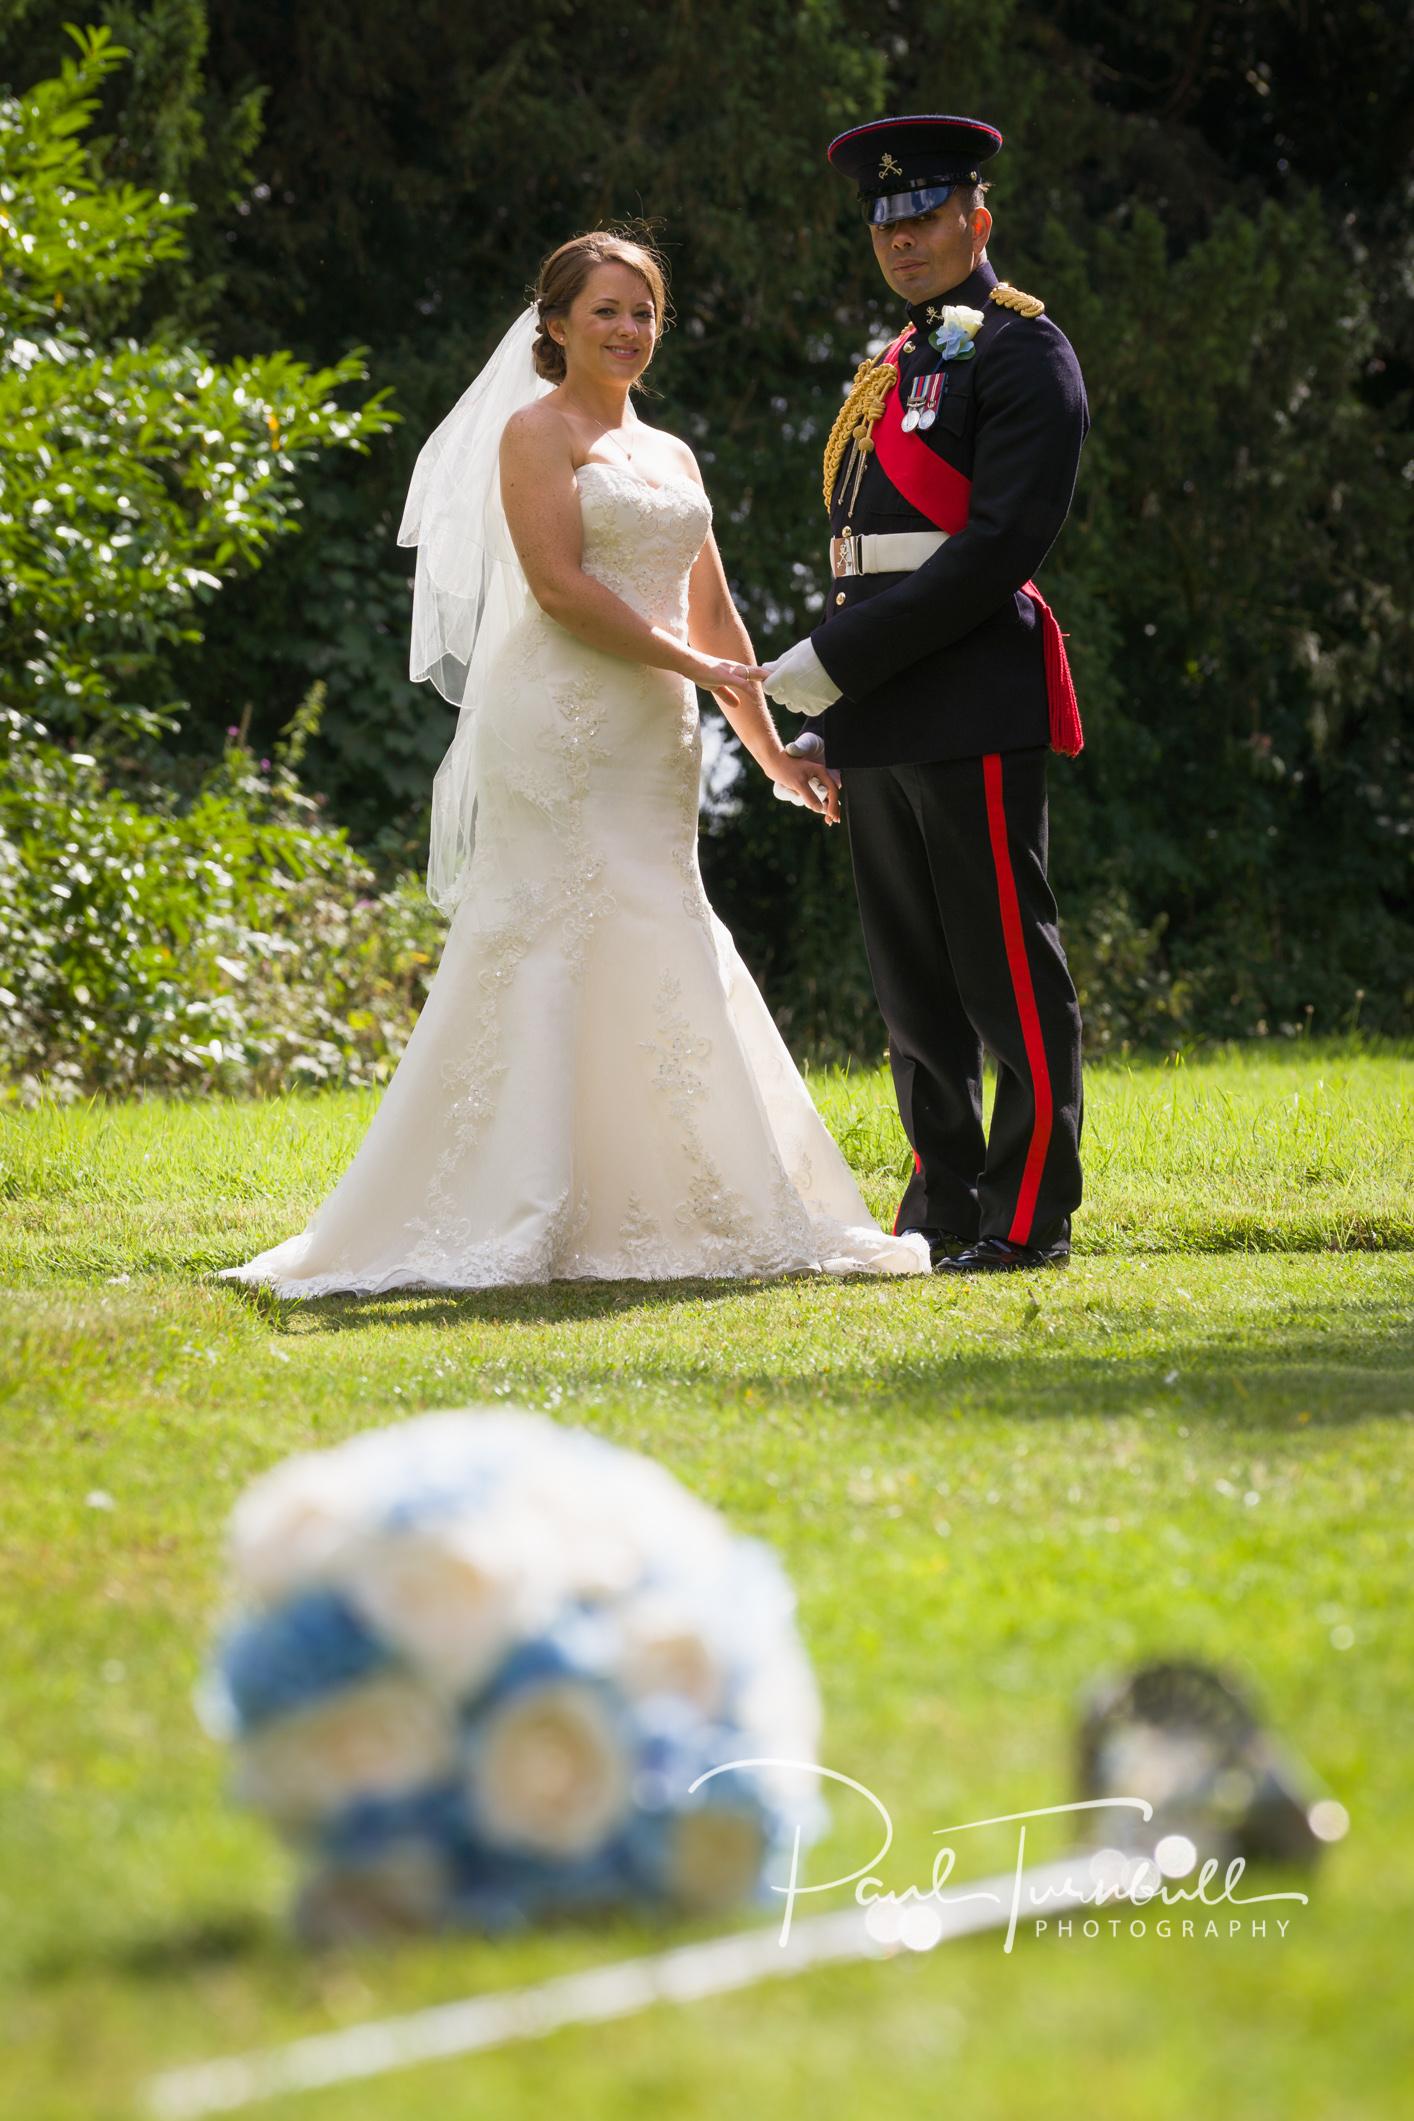 wedding-photographer-south-dalton-walkington-yorkshire-emma-james-042.jpg